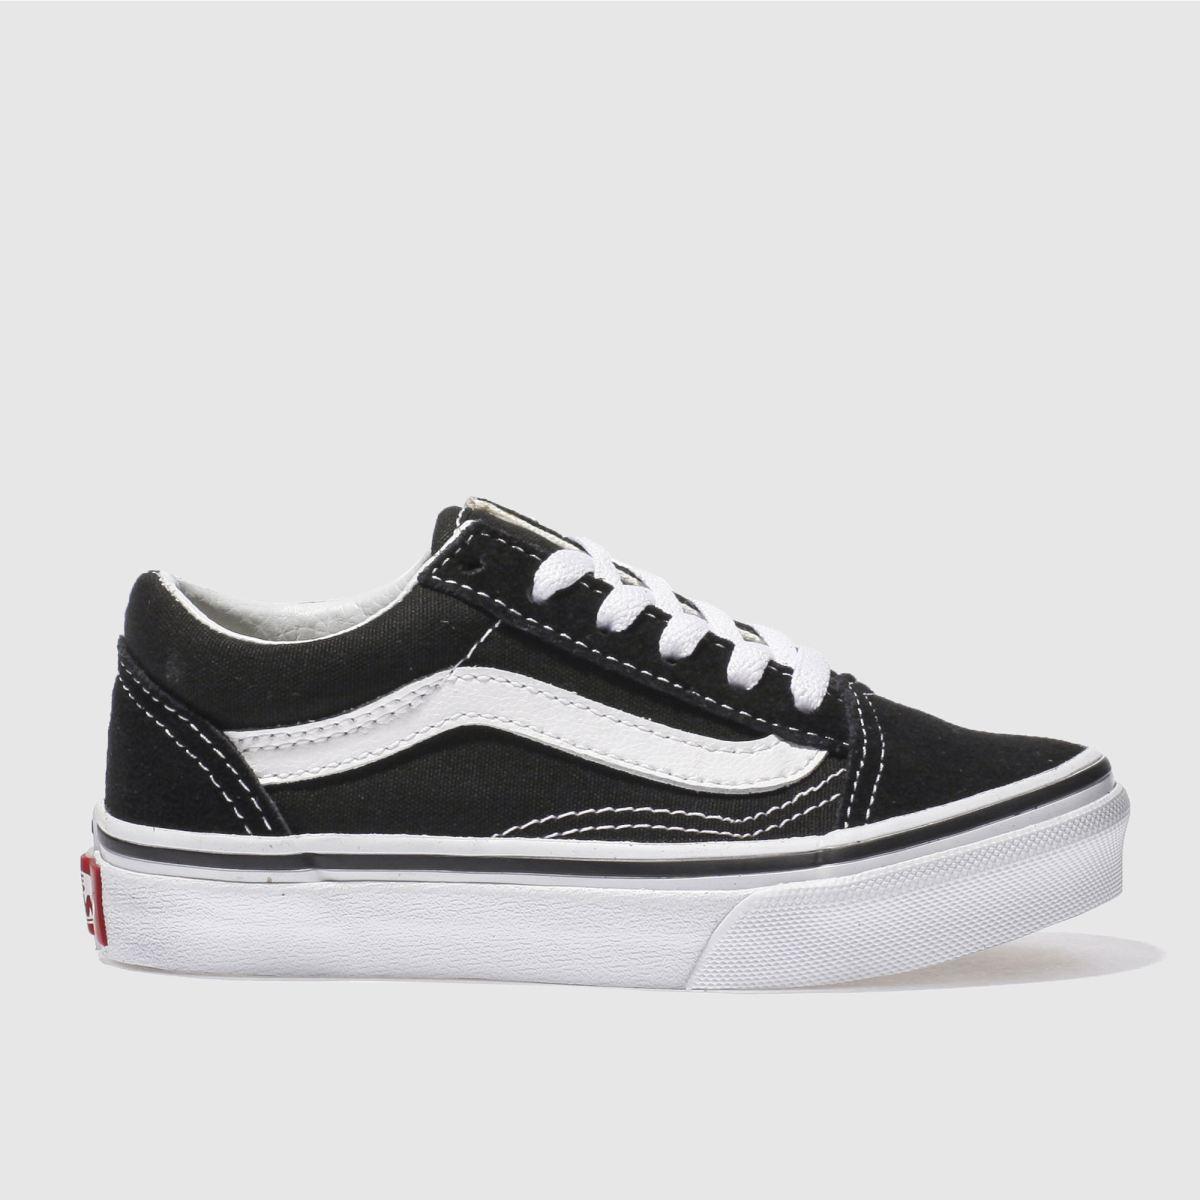 Vans Black & White Old Skool Unisex Junior Junior